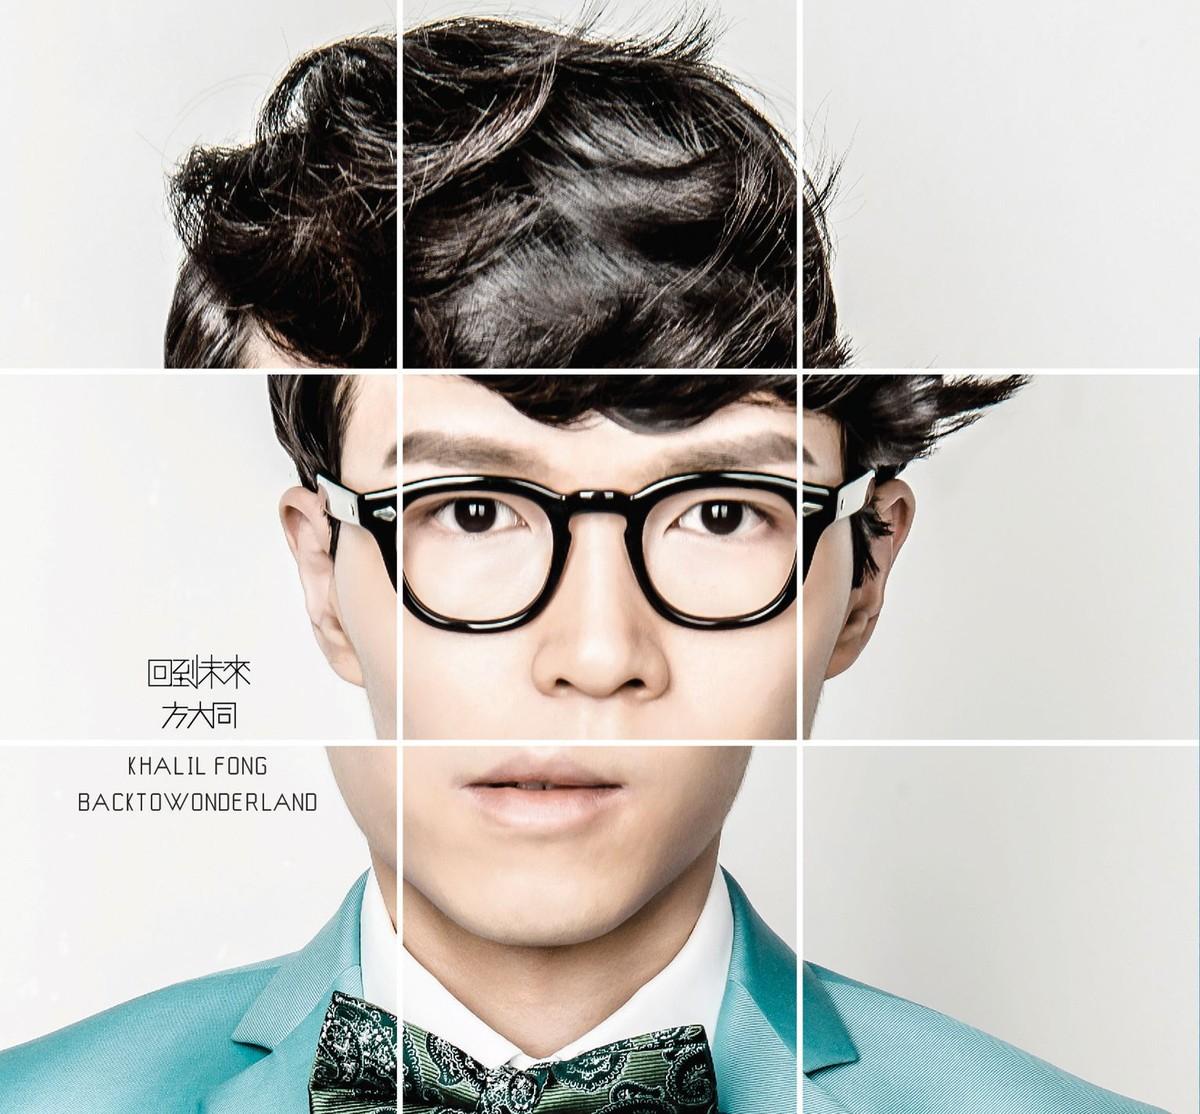 Full Song Mai Wo Dunya Mp3 Download: [ Album ] Khalil Fong